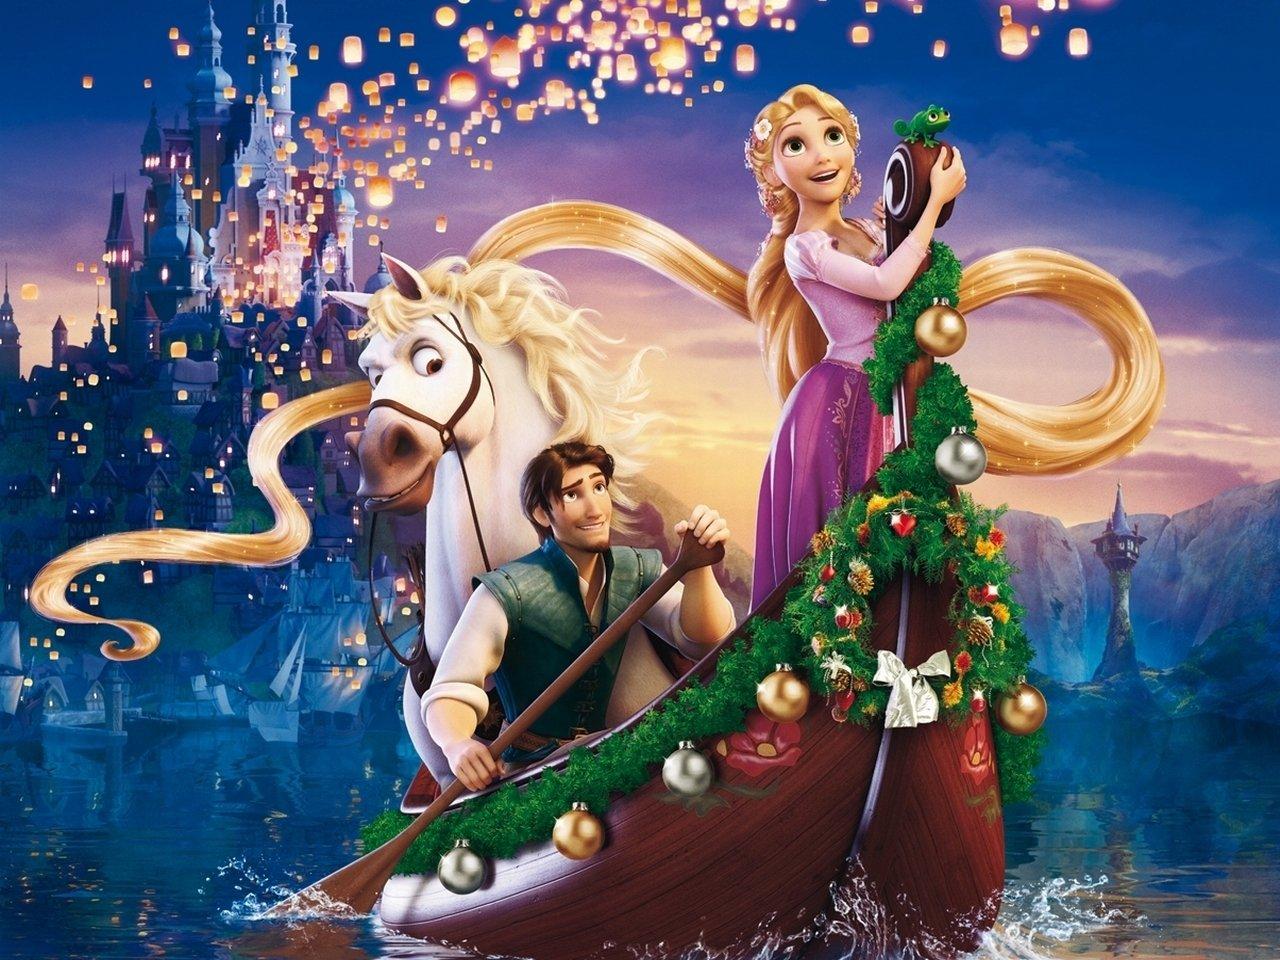 Floating Lanterns Pascal Rapunzel Tangled HD Background Wallpaper 1280x960